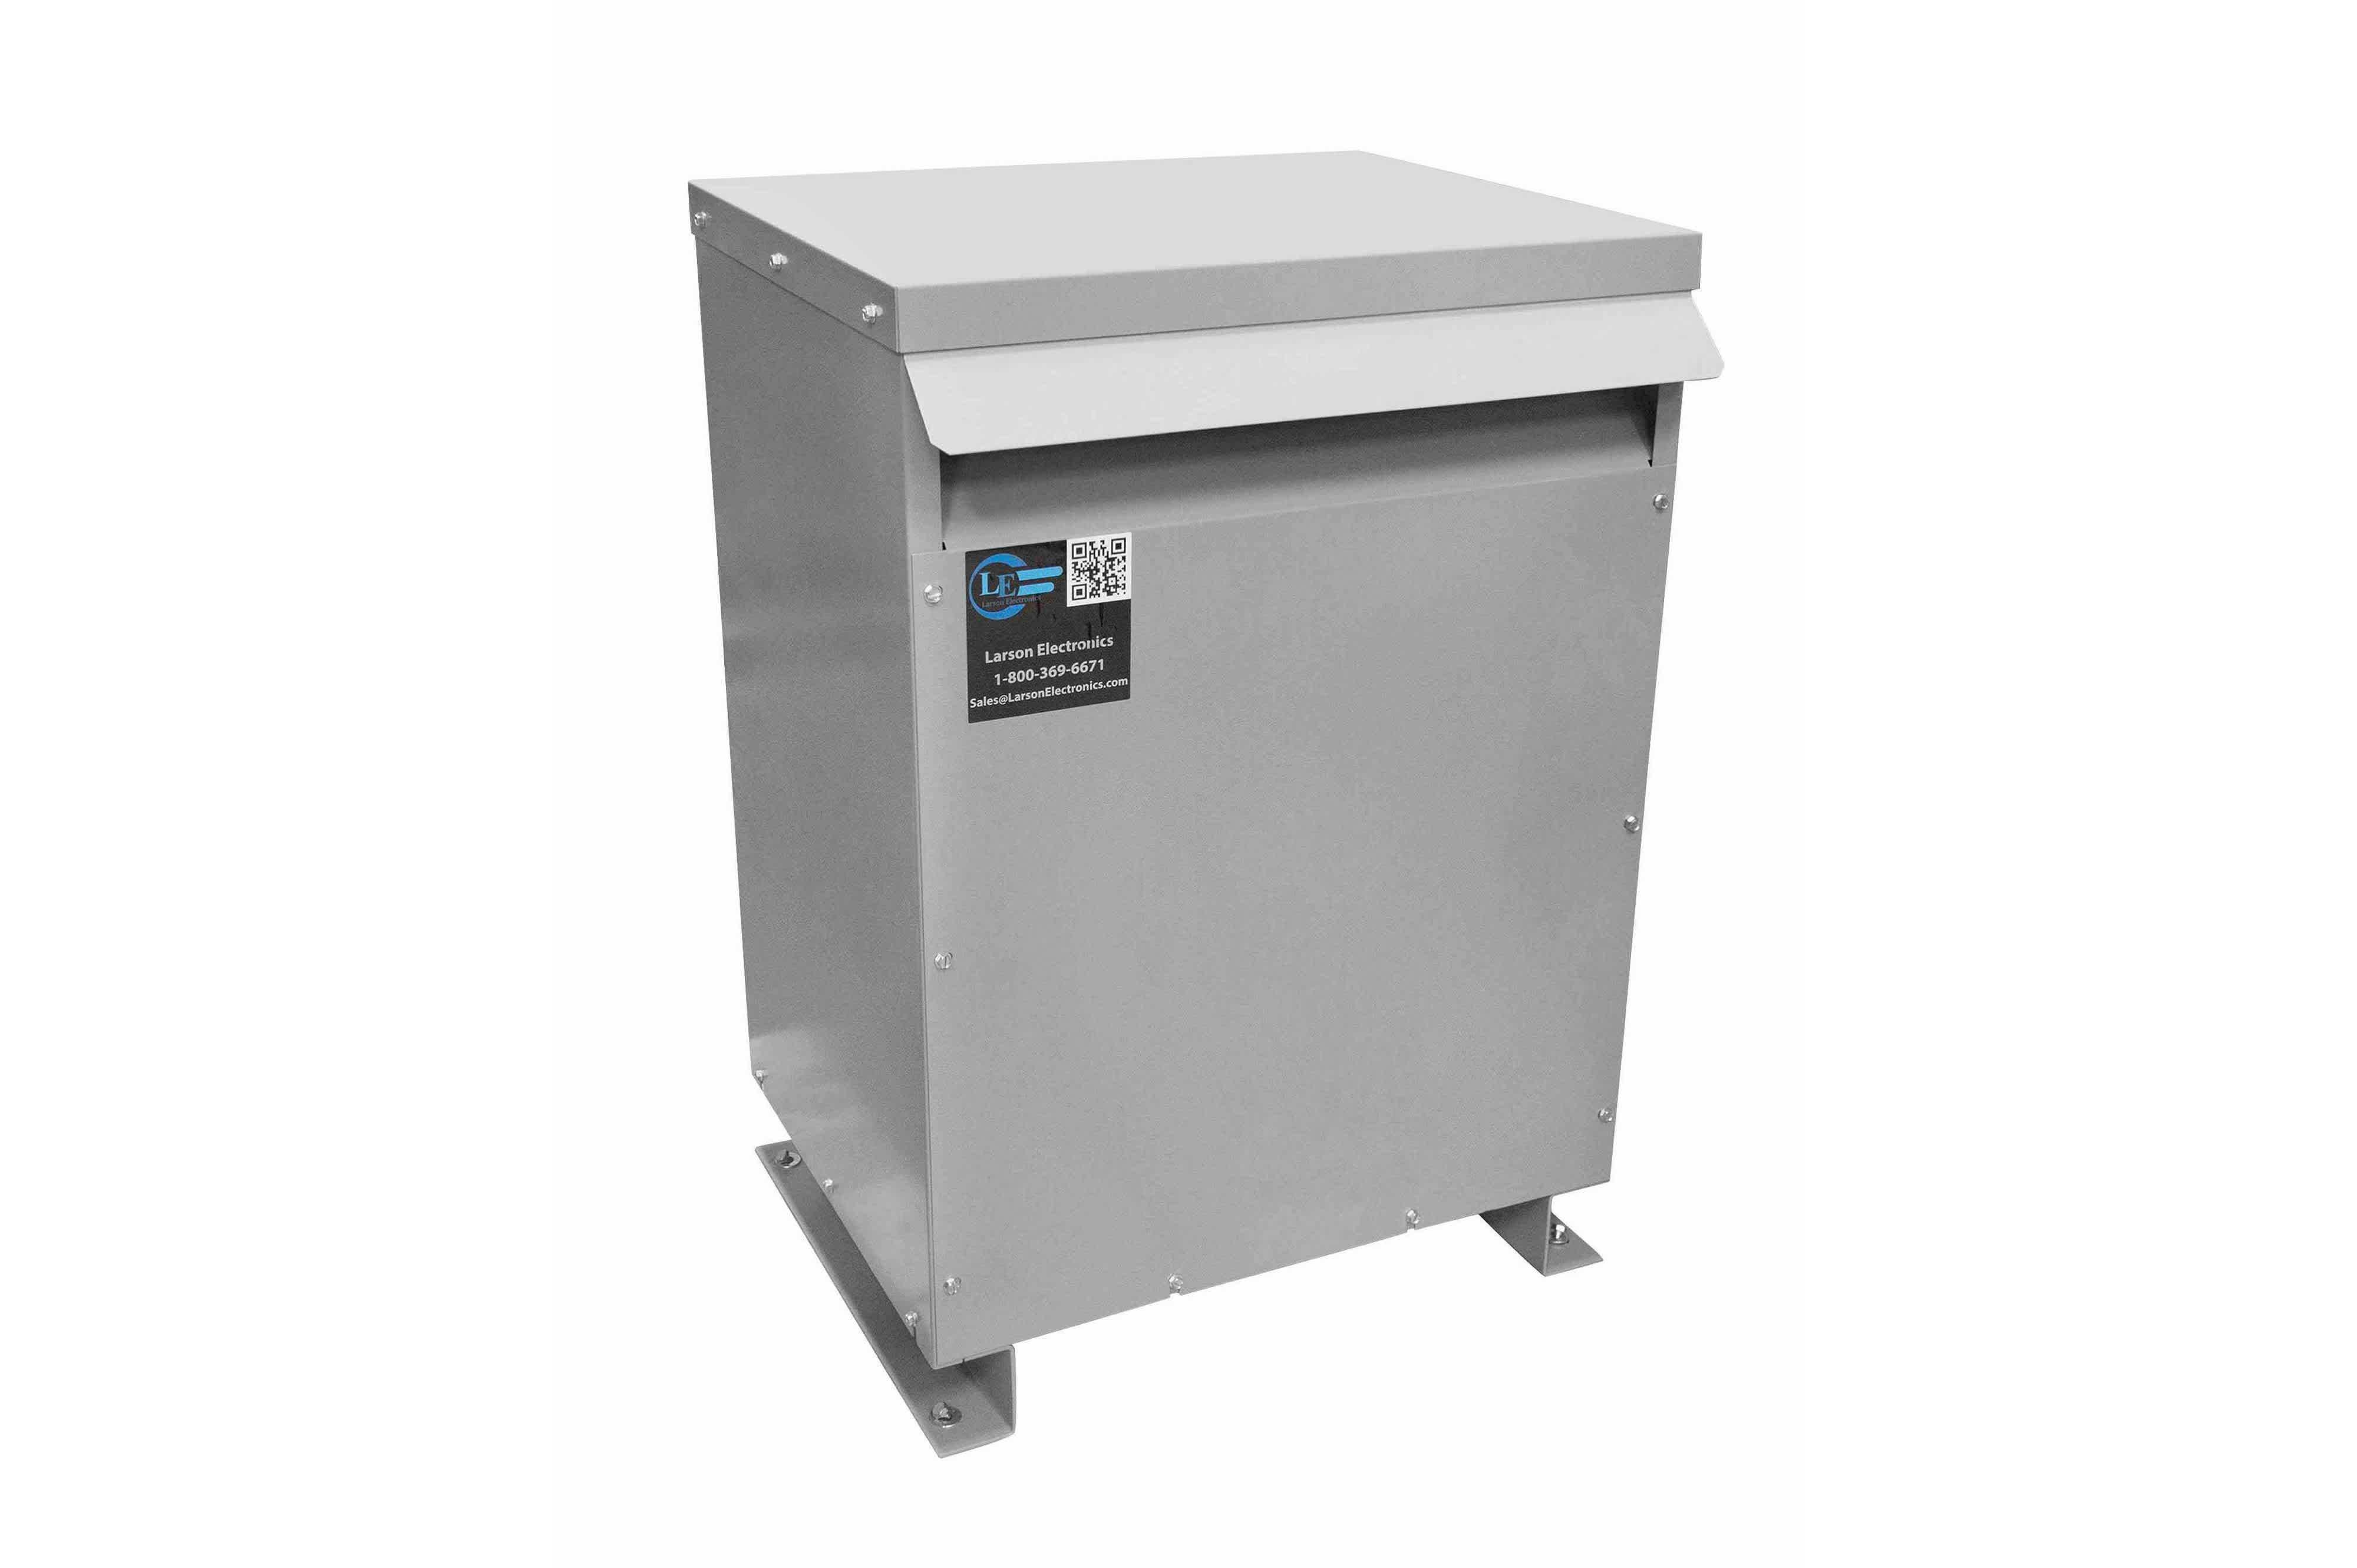 15 kVA 3PH Isolation Transformer, 220V Wye Primary, 480Y/277 Wye-N Secondary, N3R, Ventilated, 60 Hz